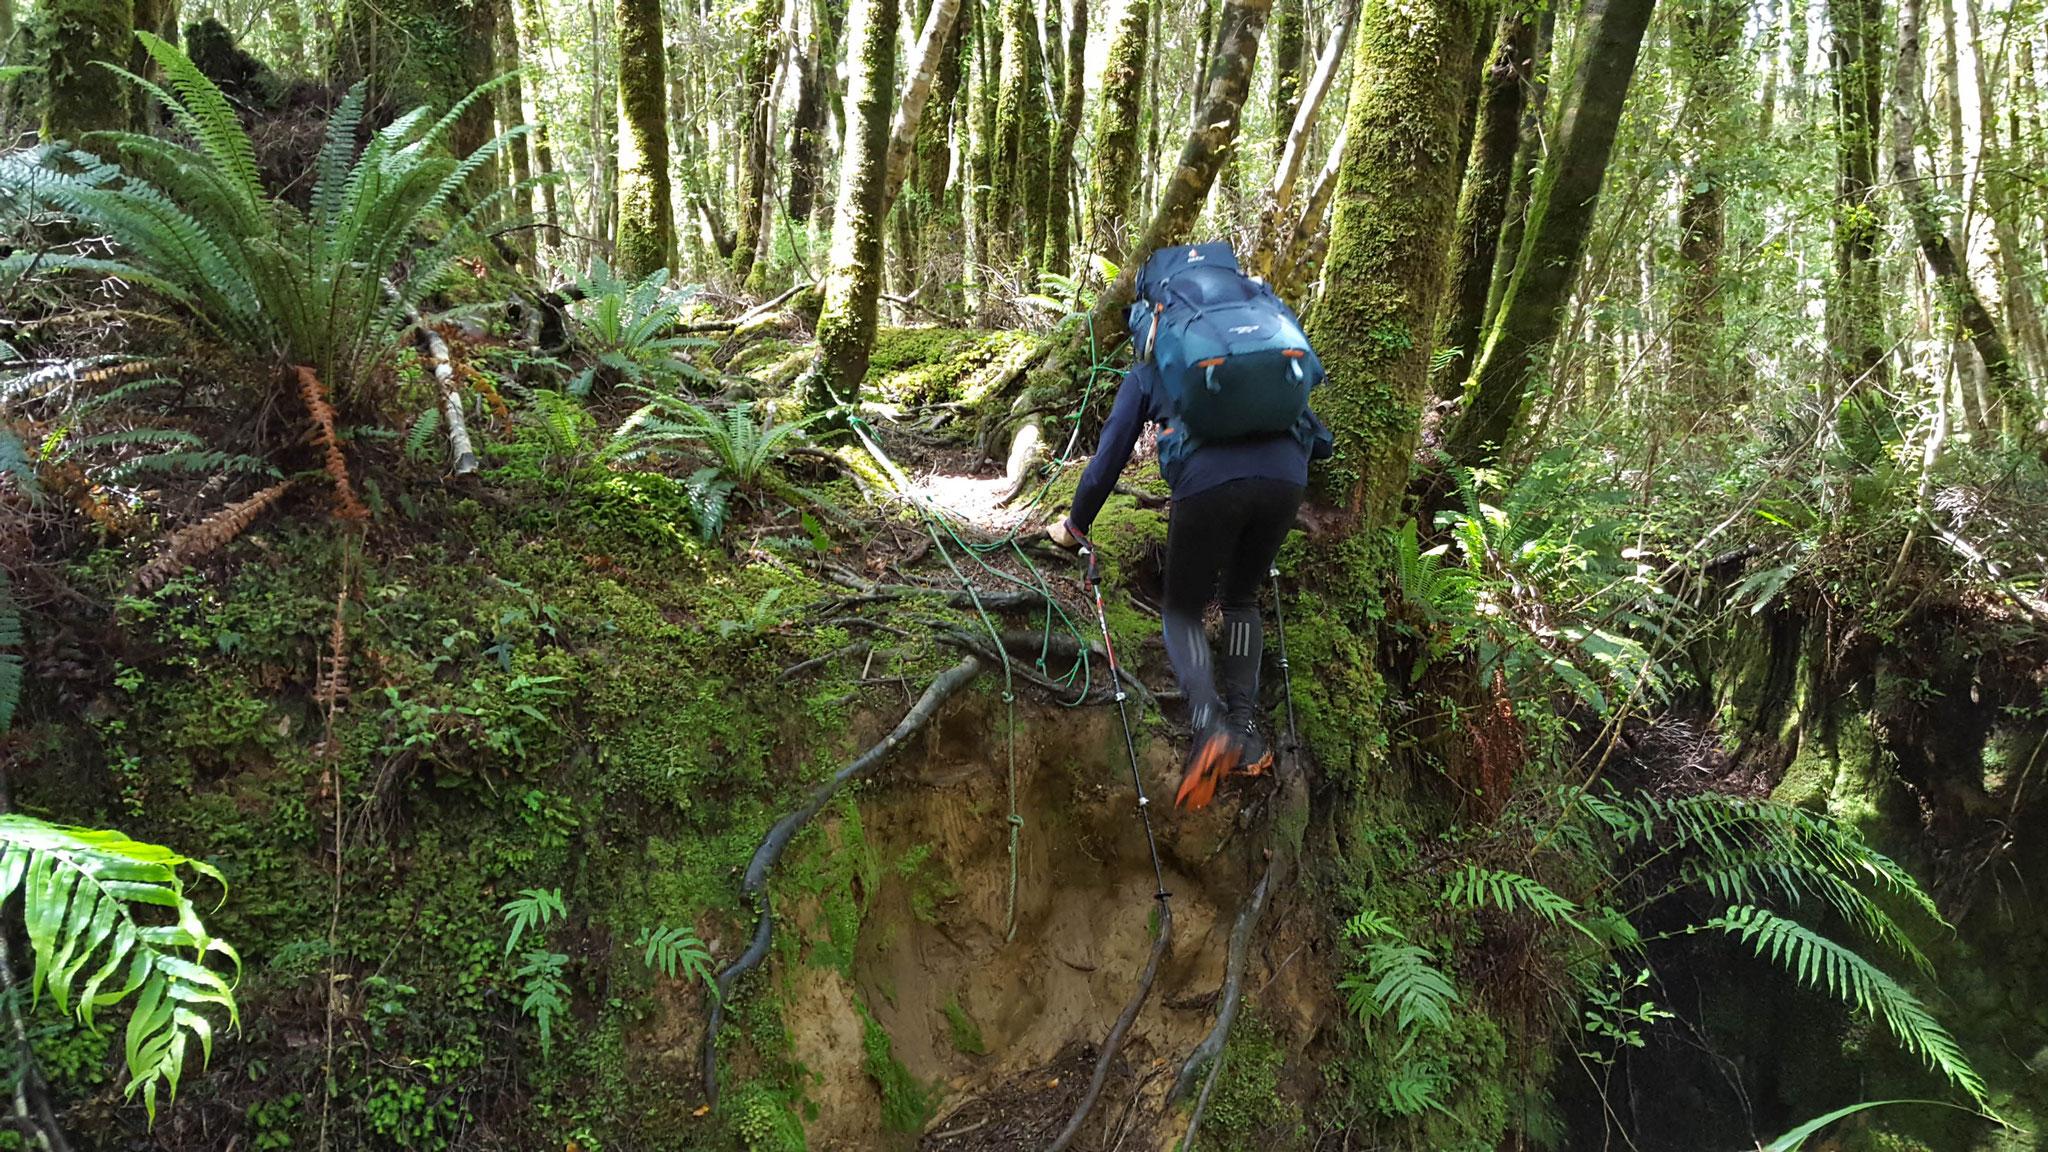 der Weg ist immer wieder unterspült am Te Araroa